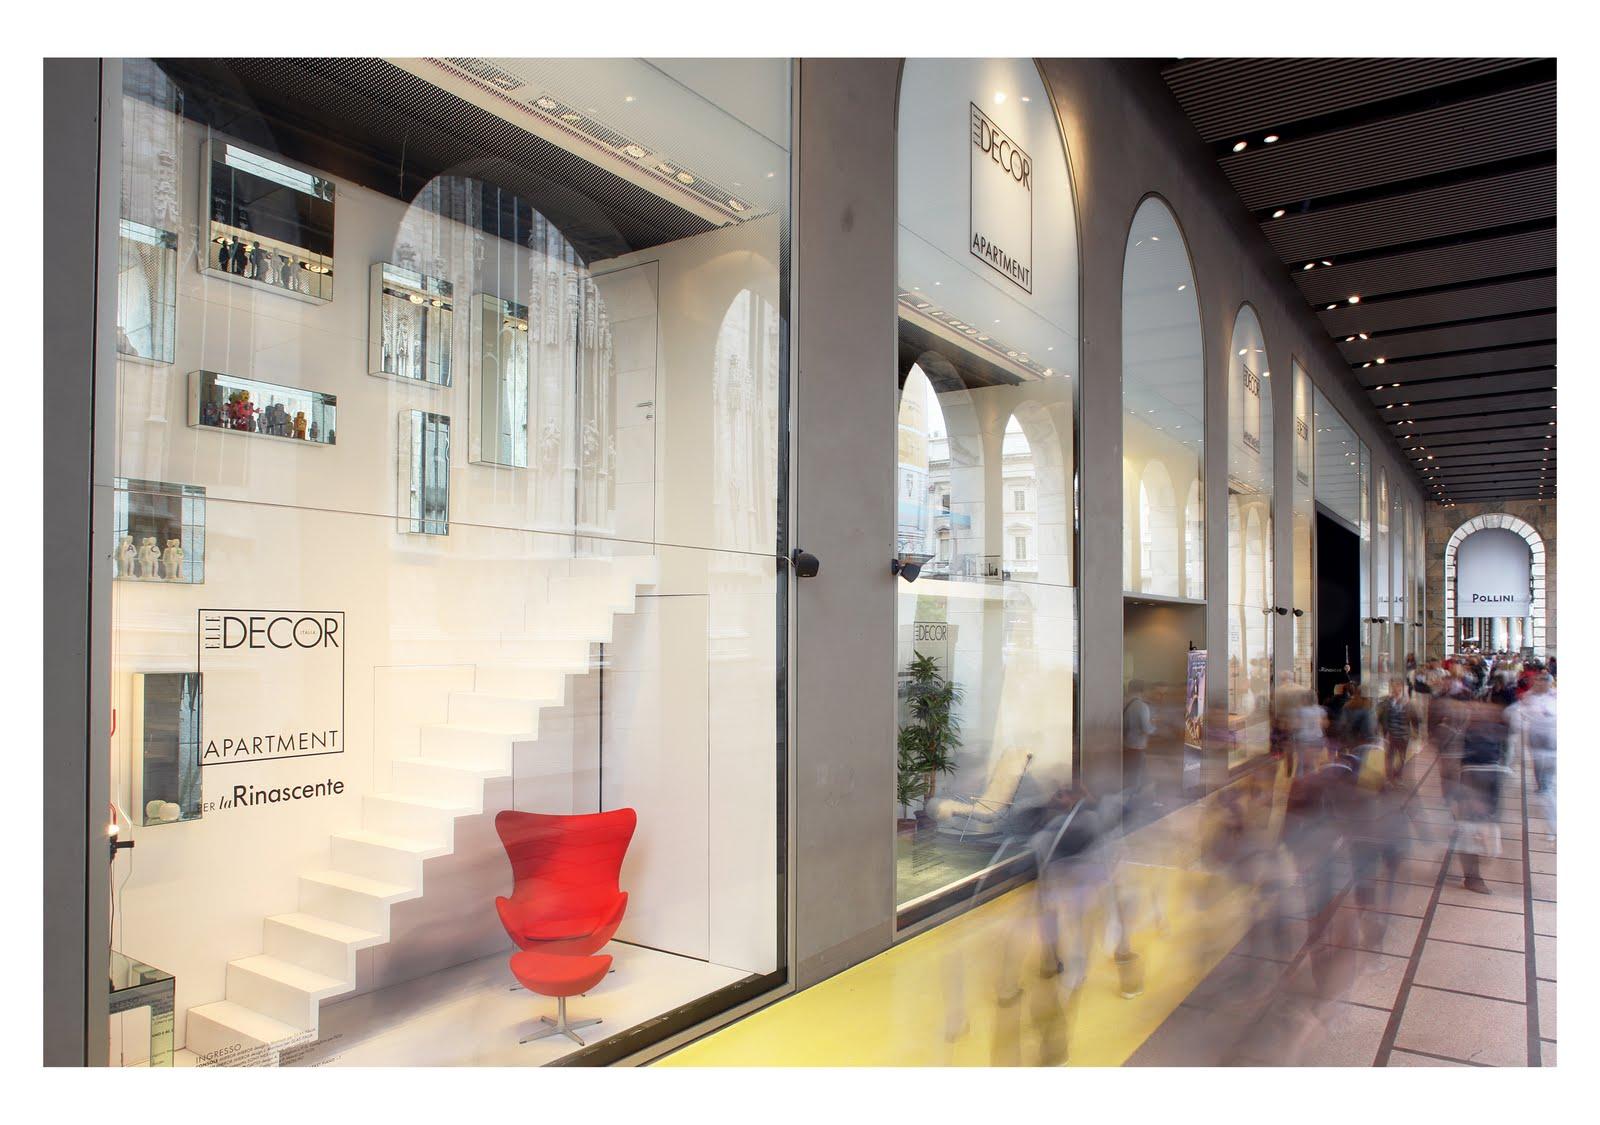 Elle decor apartment at rinascente milan design your life for Elle decor interni